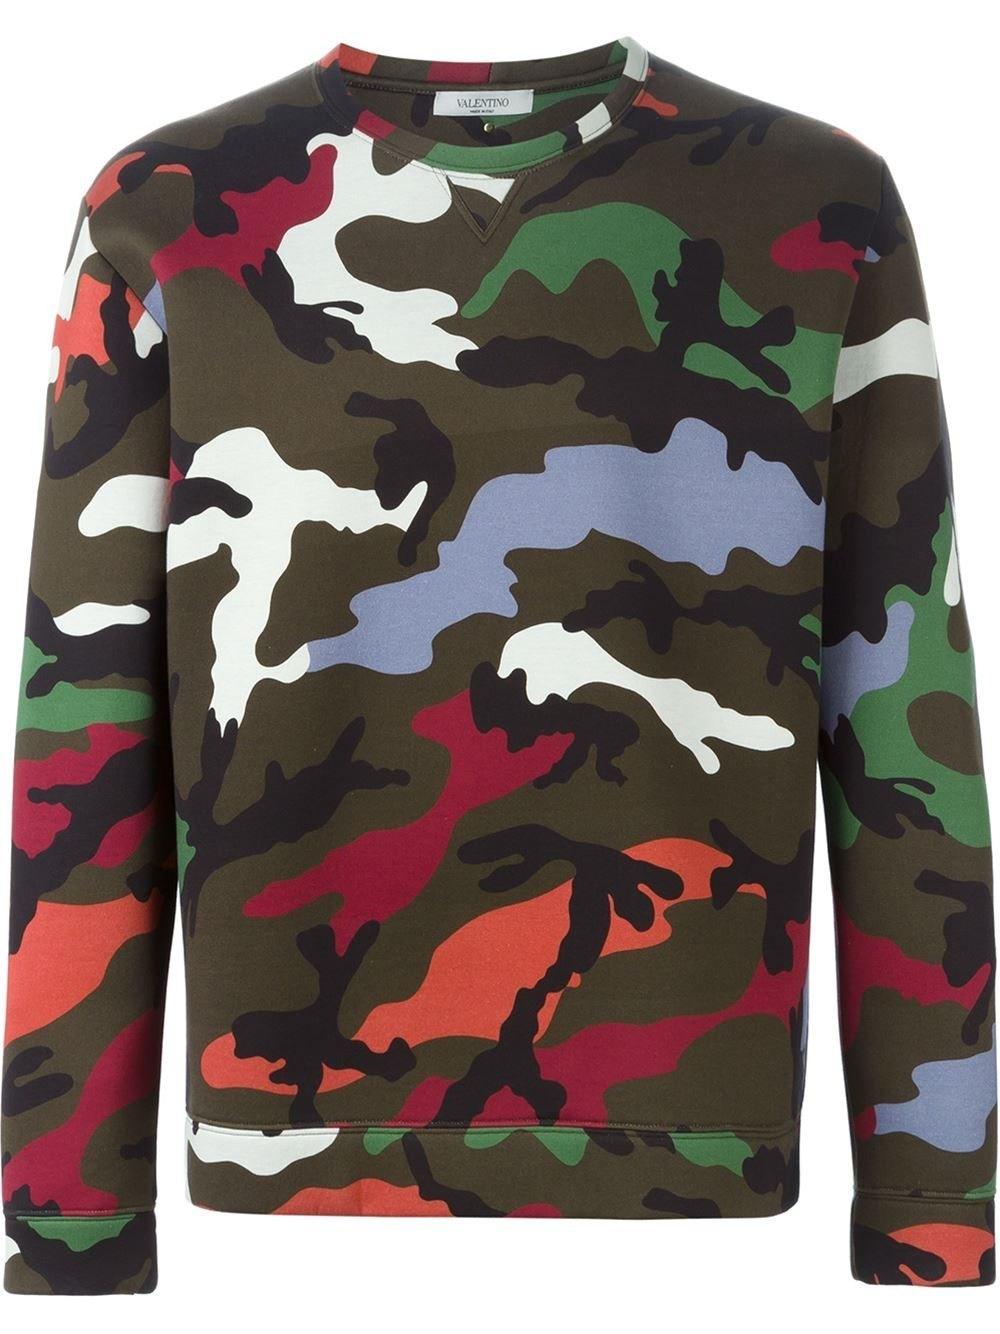 Men Fashion Camouflage Digital Print Sweatshirt Sportswear Top Clothing